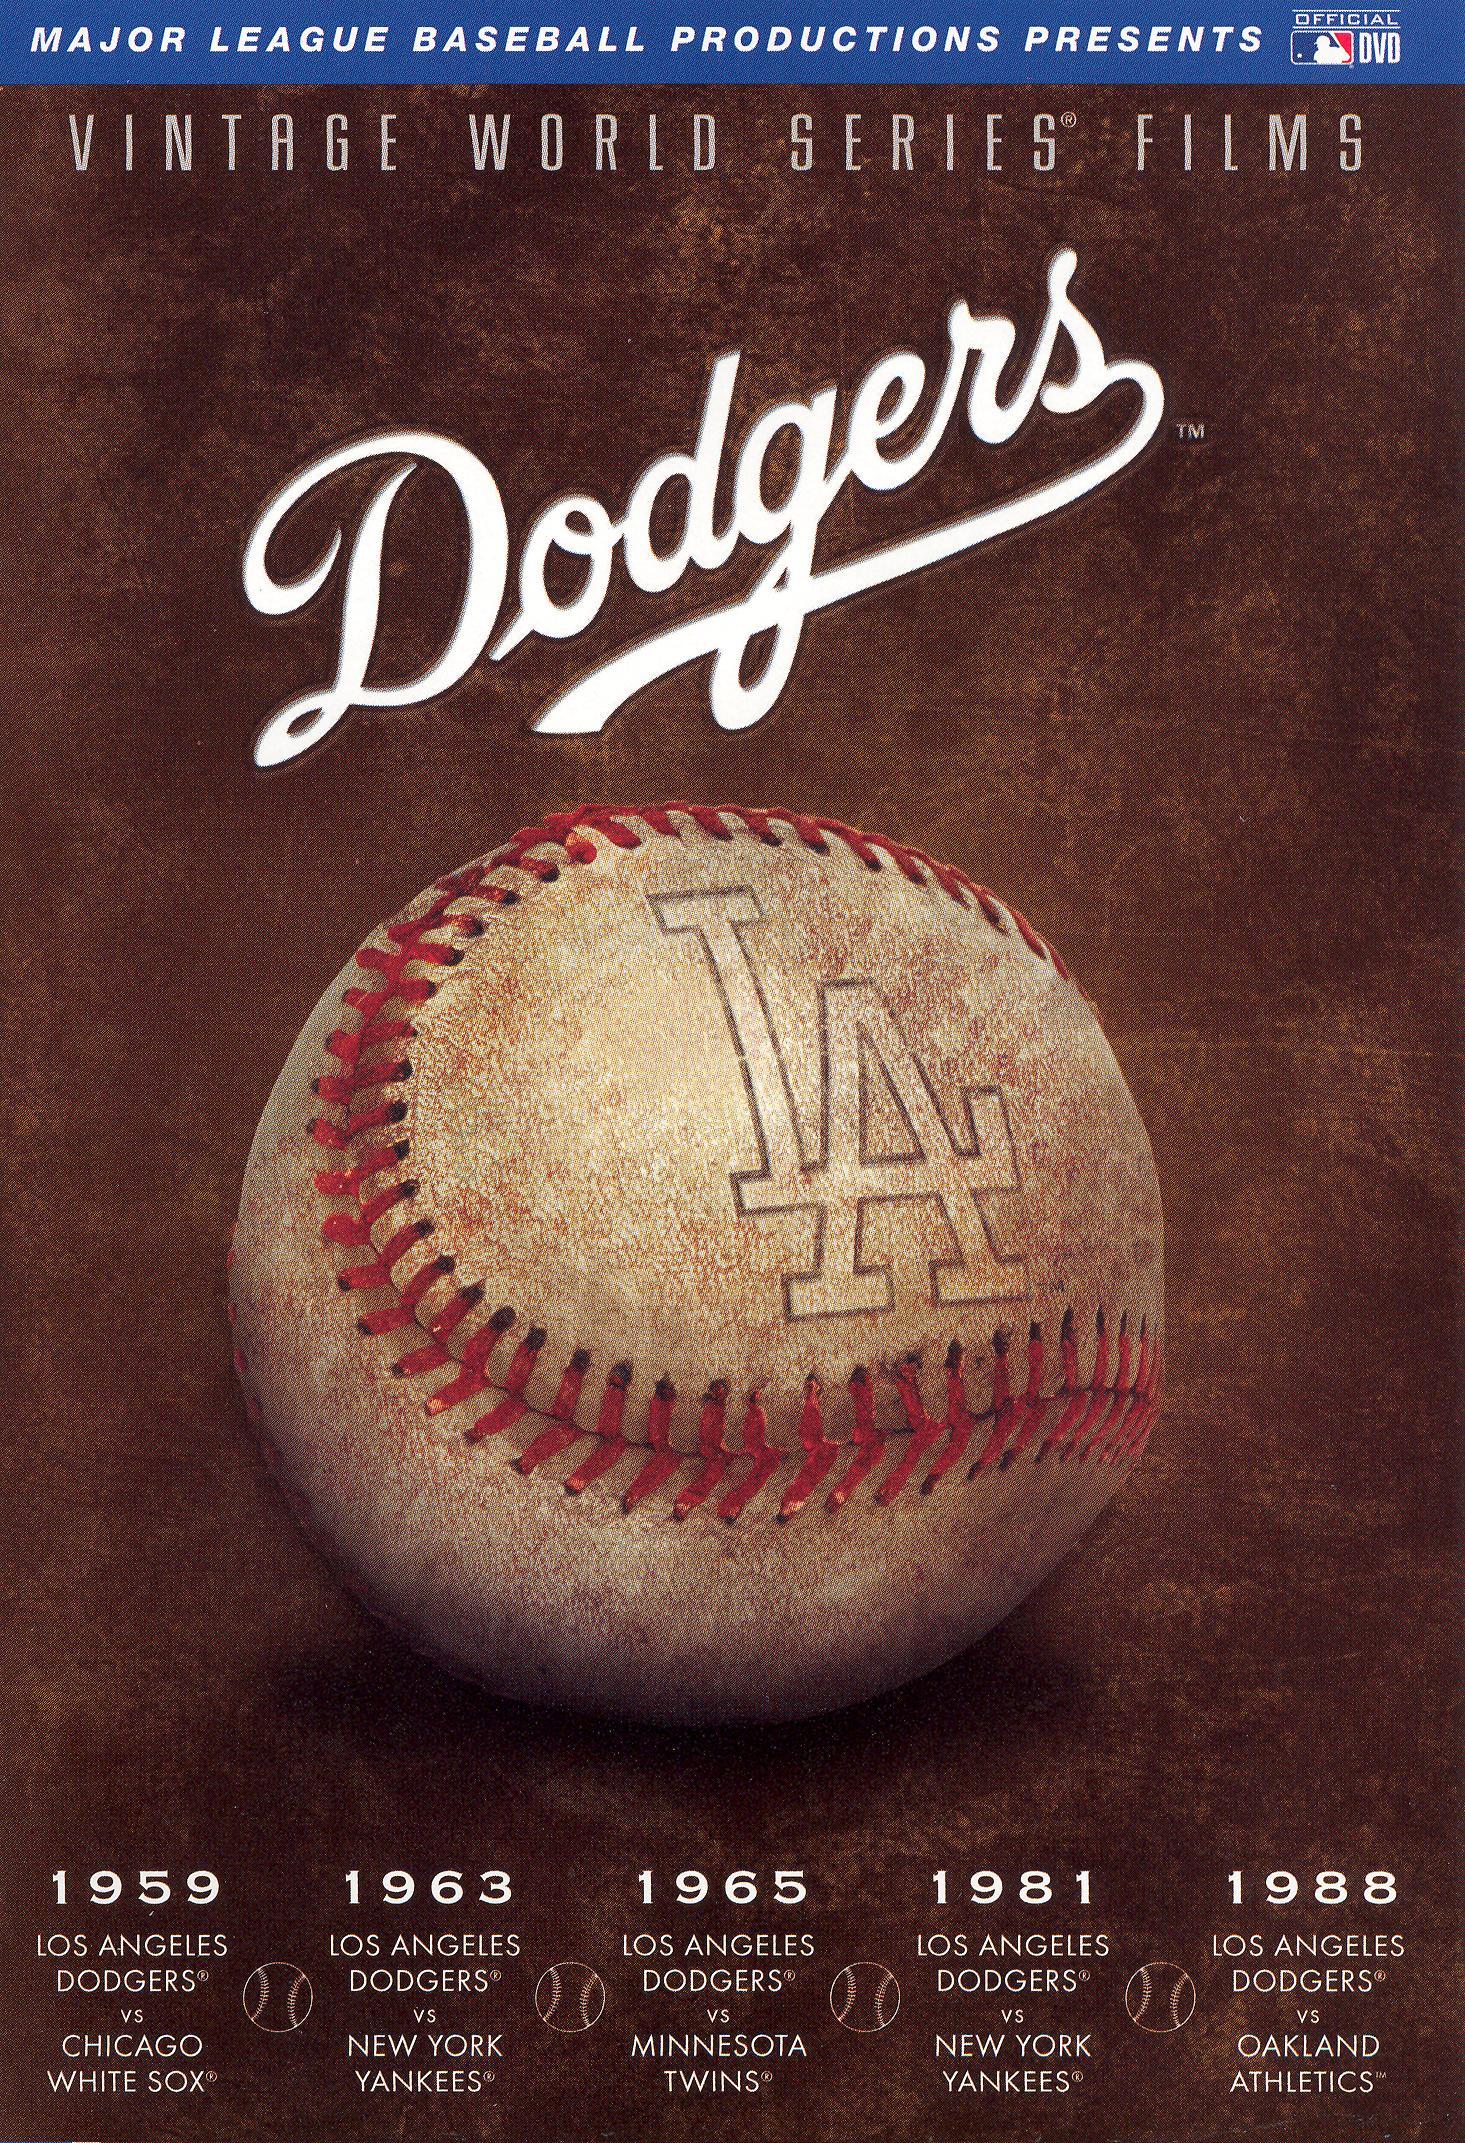 Vintage World Series Films: Los Angeles Dodgers